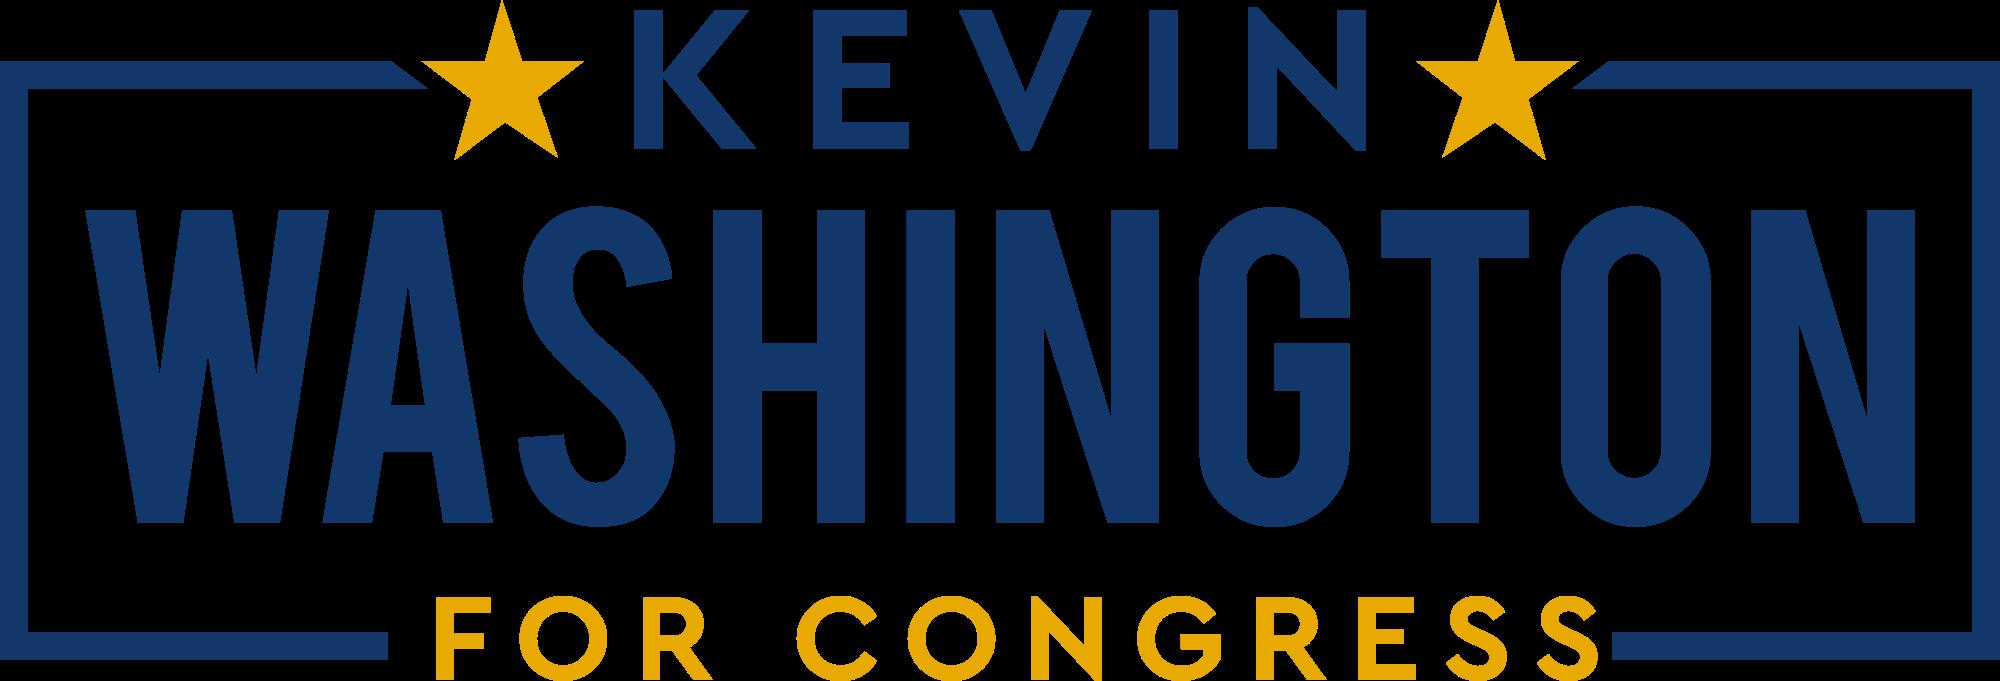 Kevin Washington